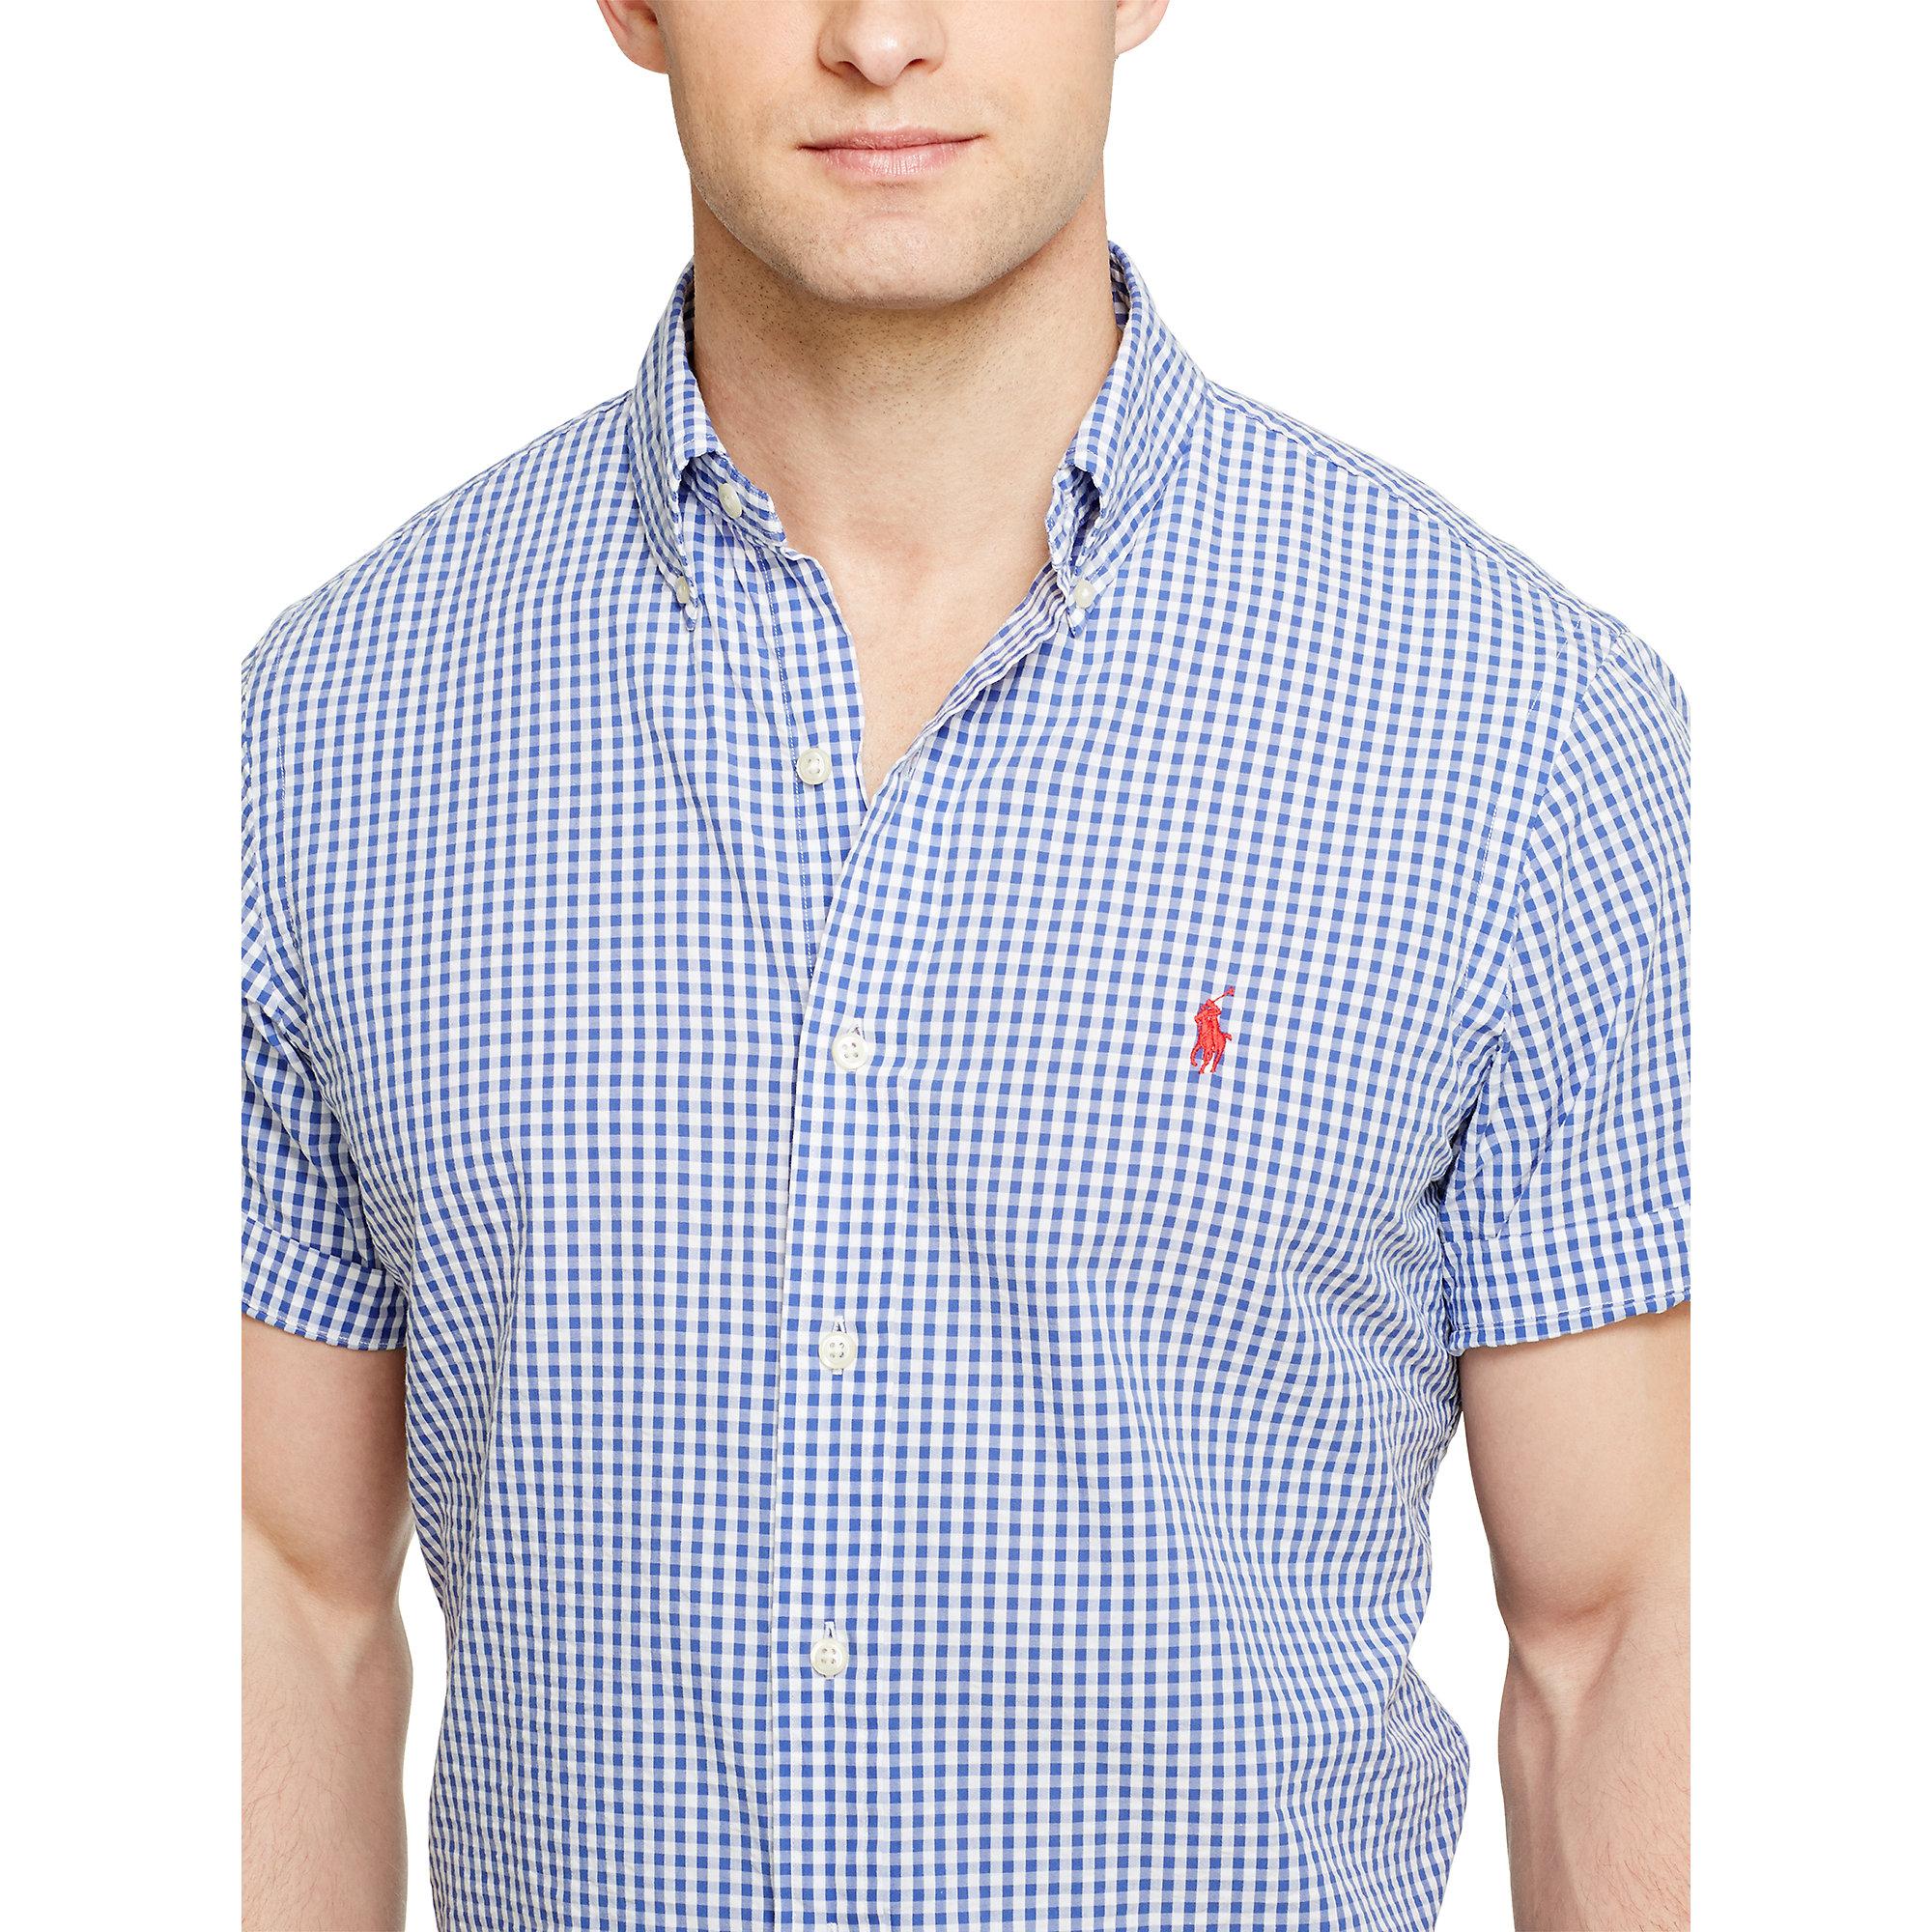 Polo Ralph Lauren Gingham Seersucker Shirt In Blue White Blue